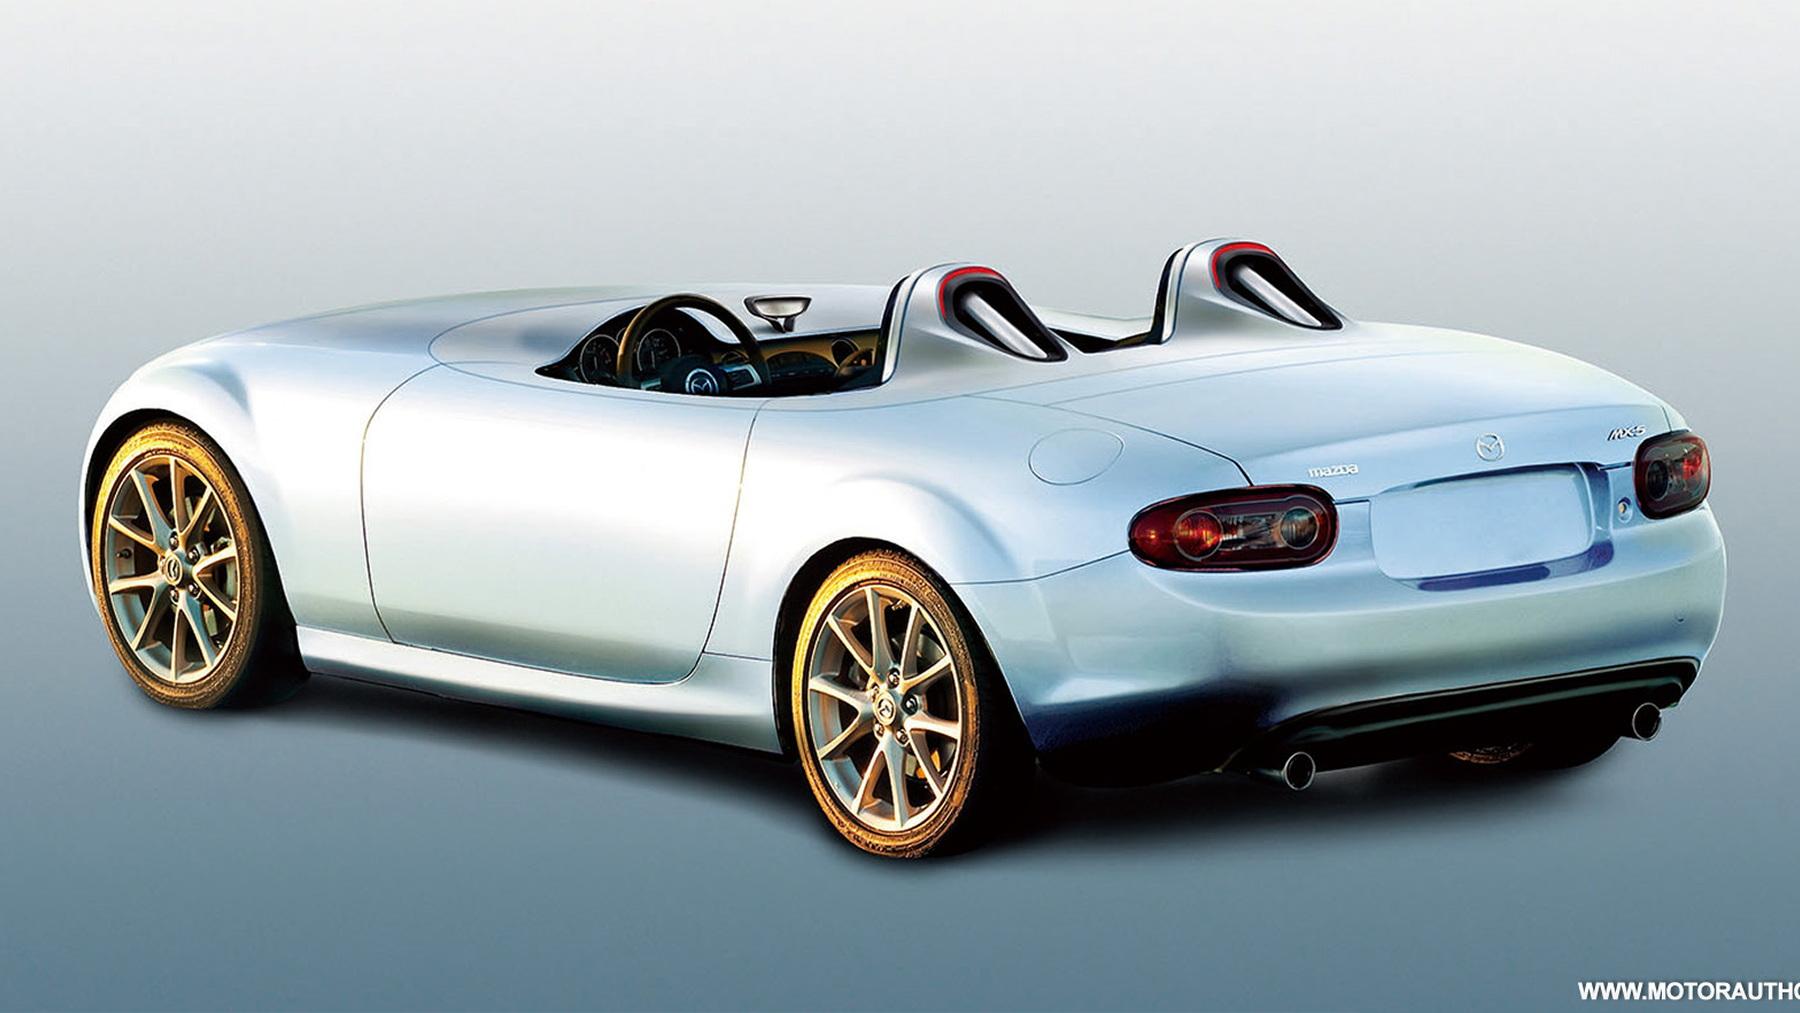 2009 mazda mx 5 superlight concept car 001